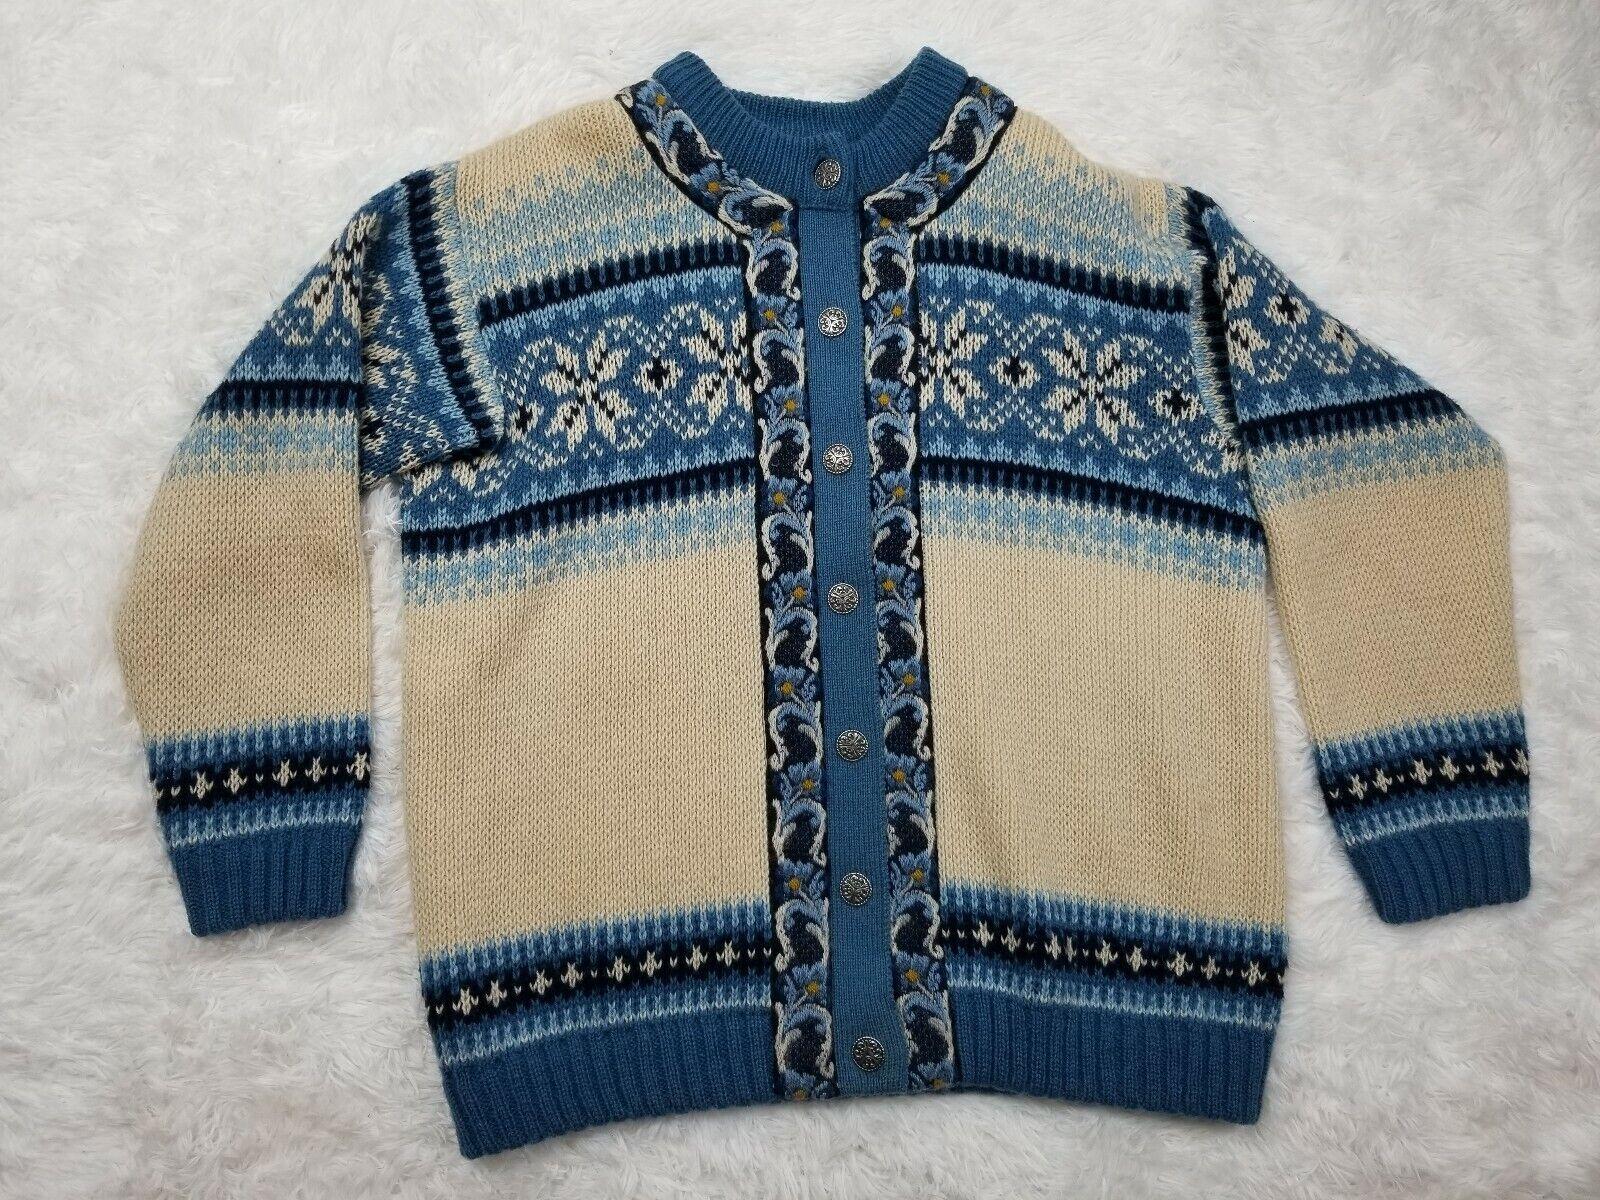 A S Evebofoss Sandane Of Norway Sweater/cardigan pure new wool Sz 44 fair isle